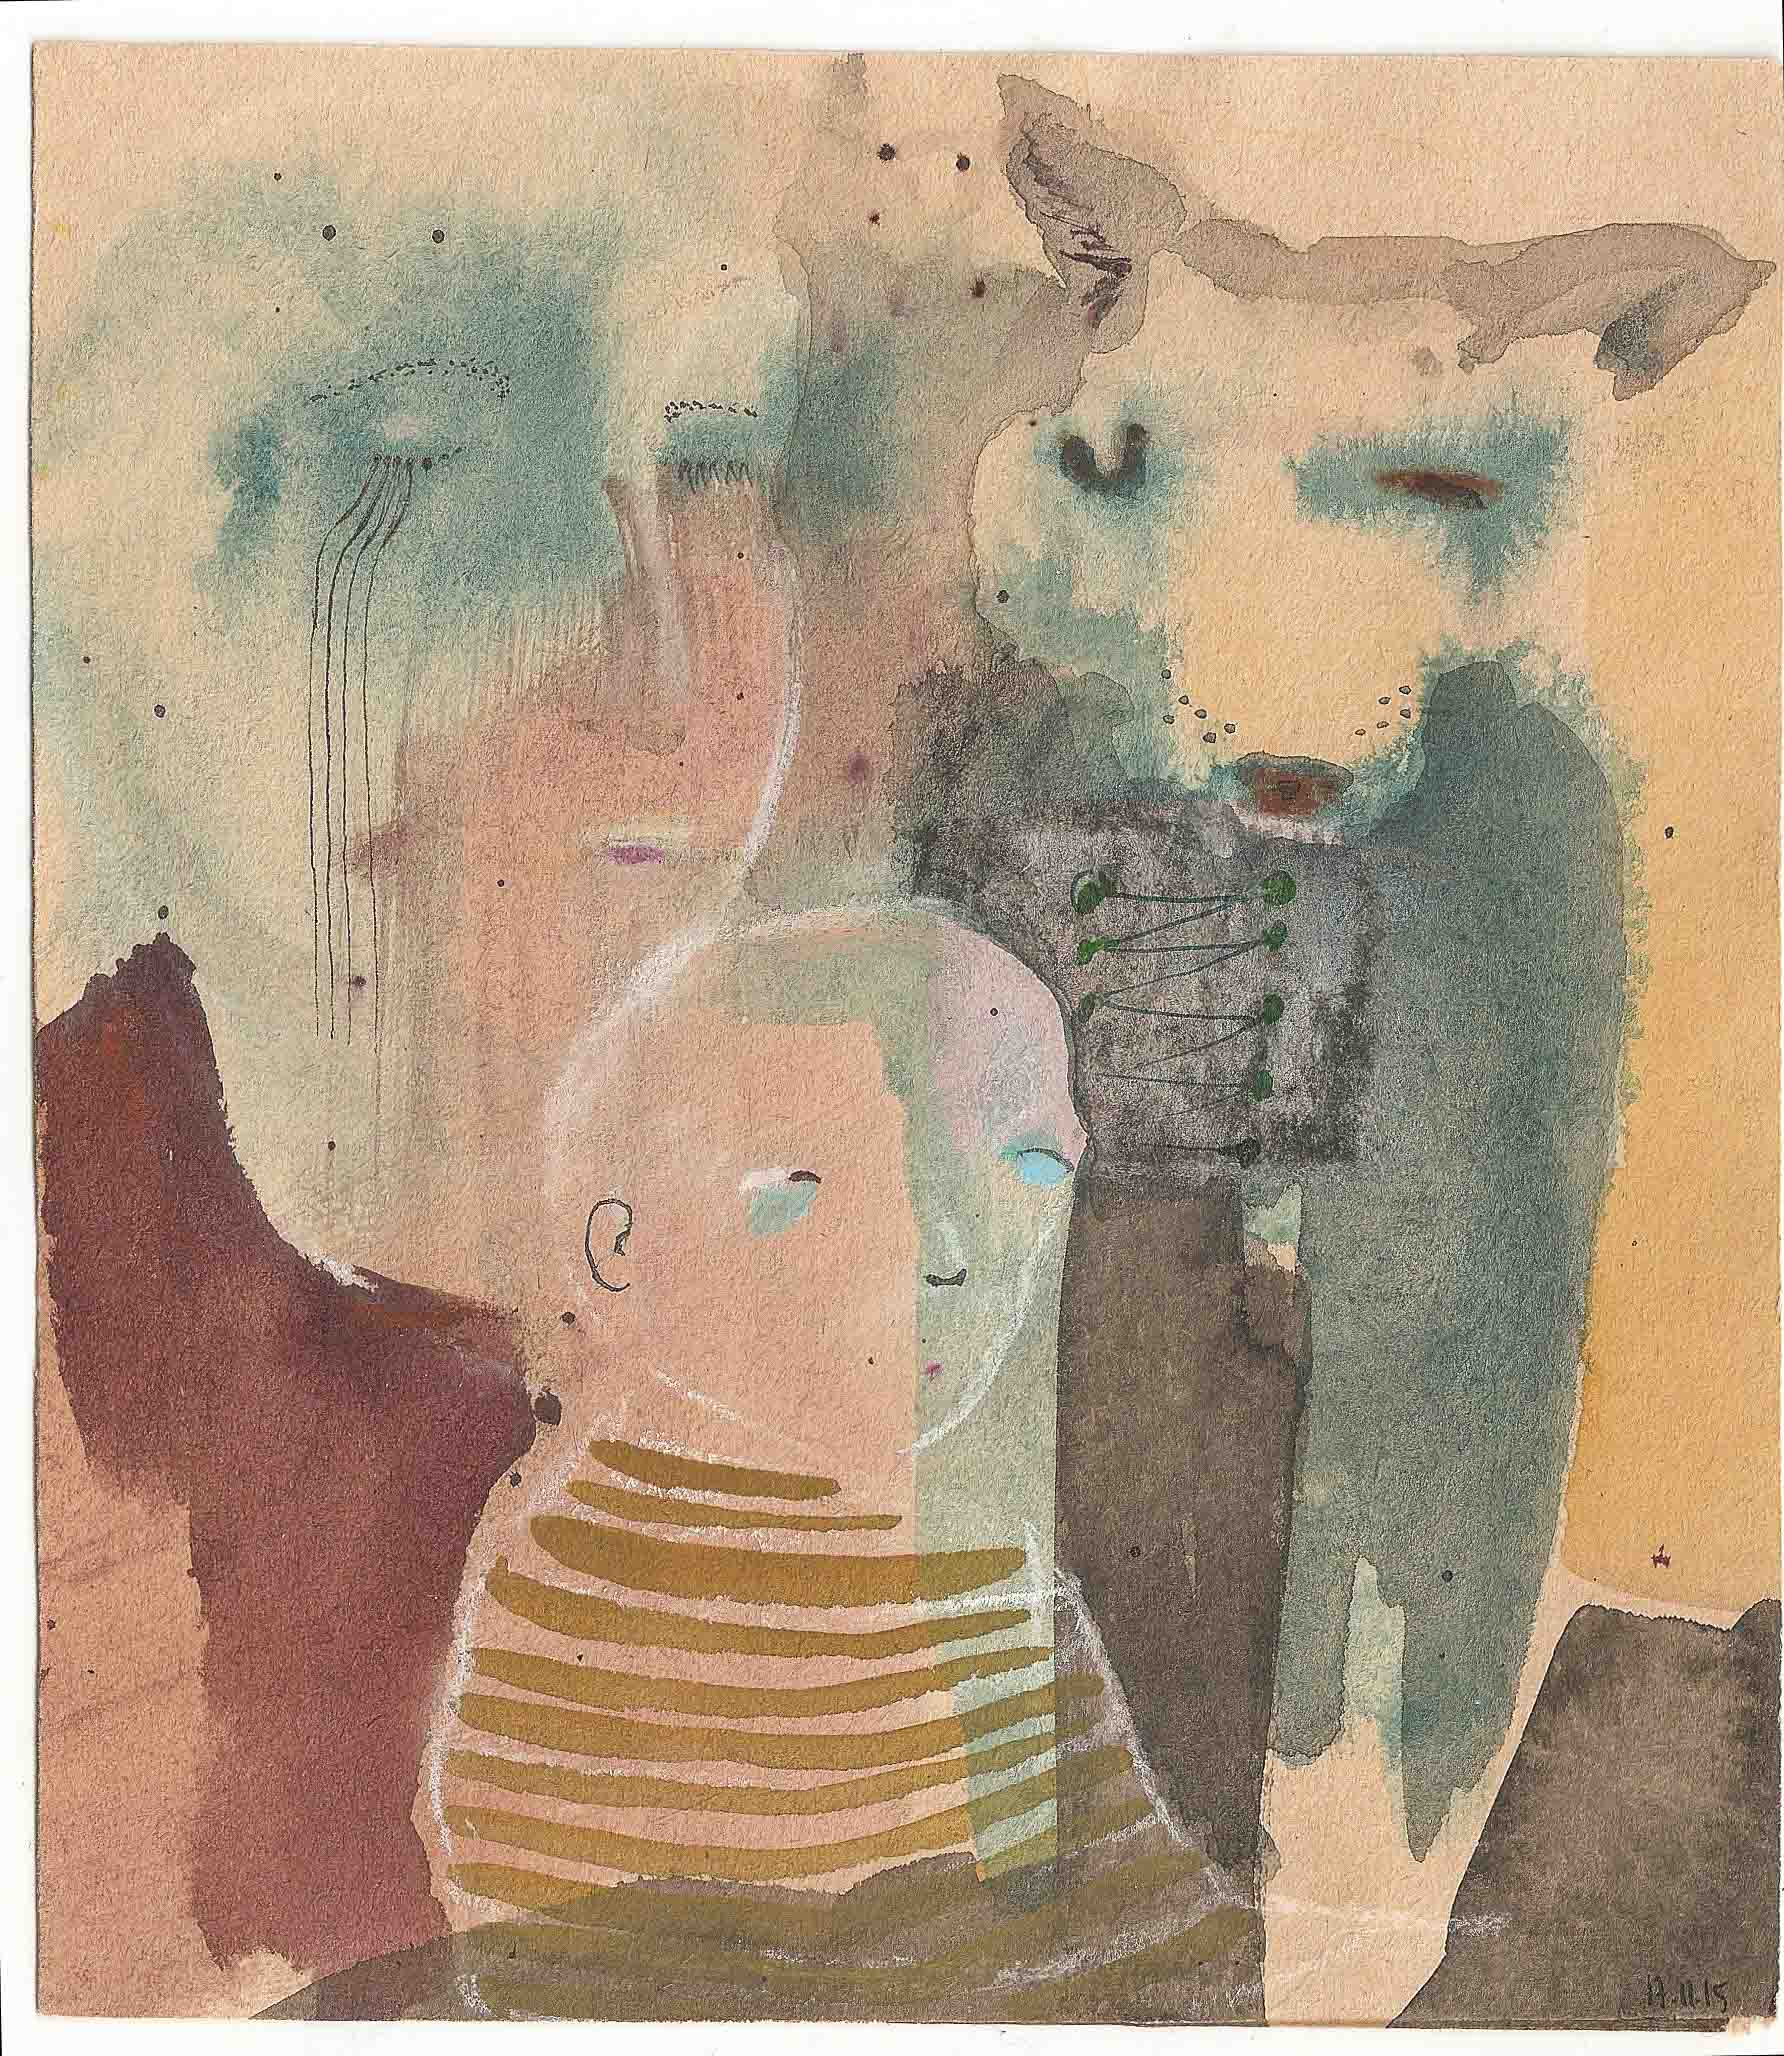 Familie, 19x17cm, Tusche, Kreide auf Papier